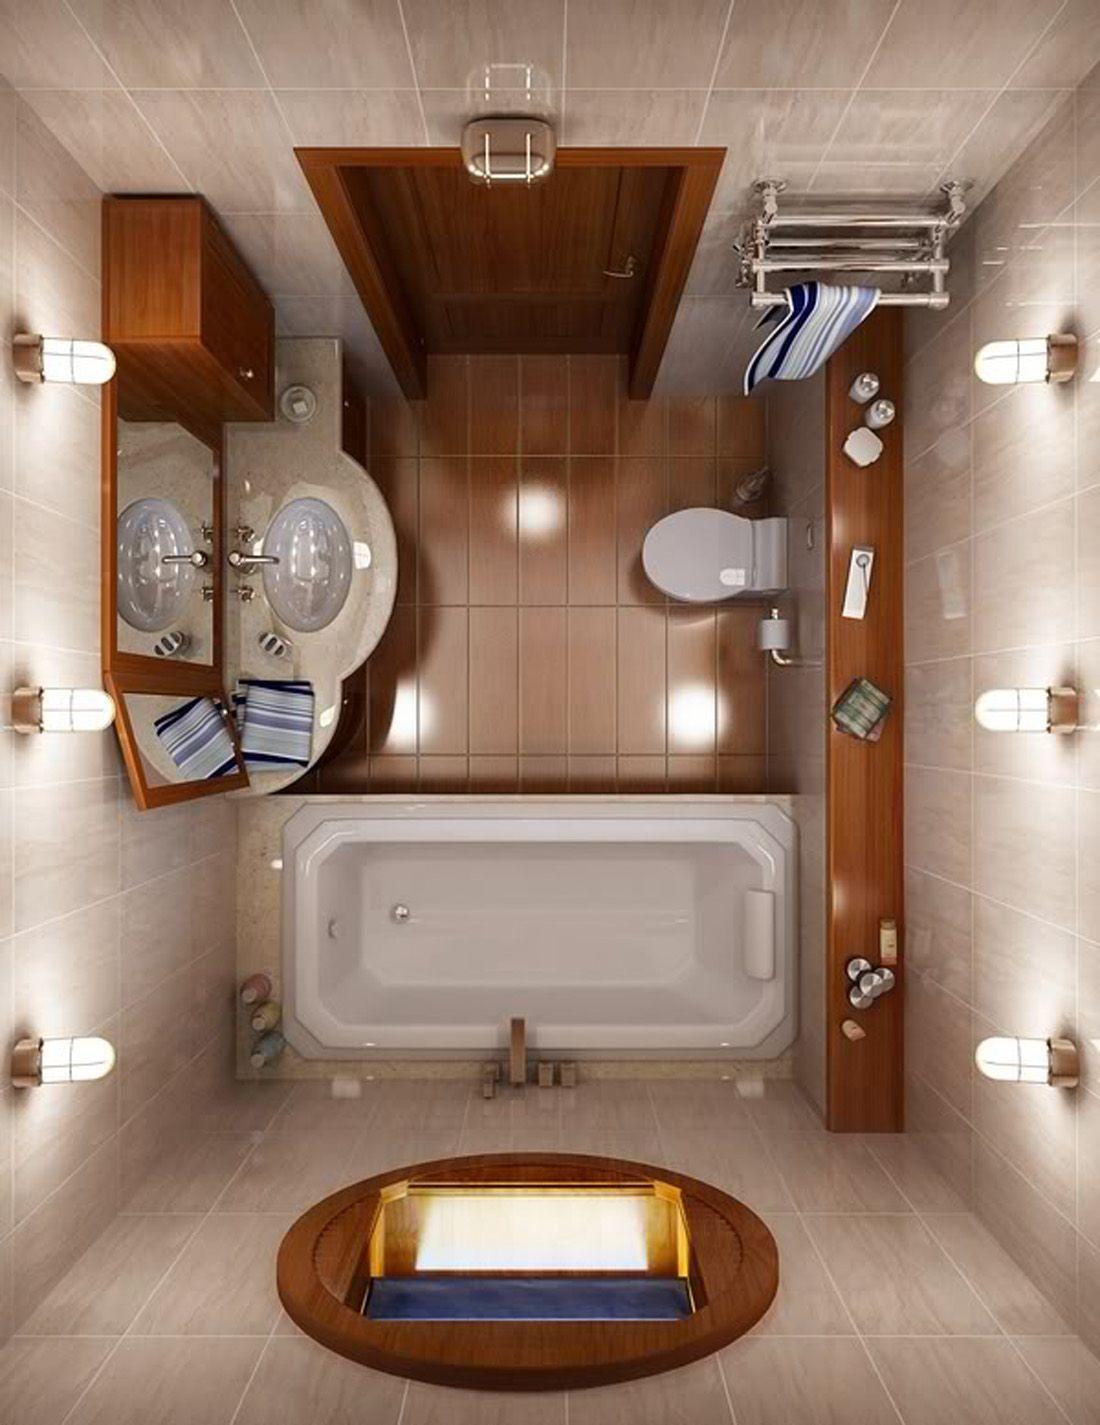 42 desain kamar mandi sempit minimalis ukuran kecil yang cantik